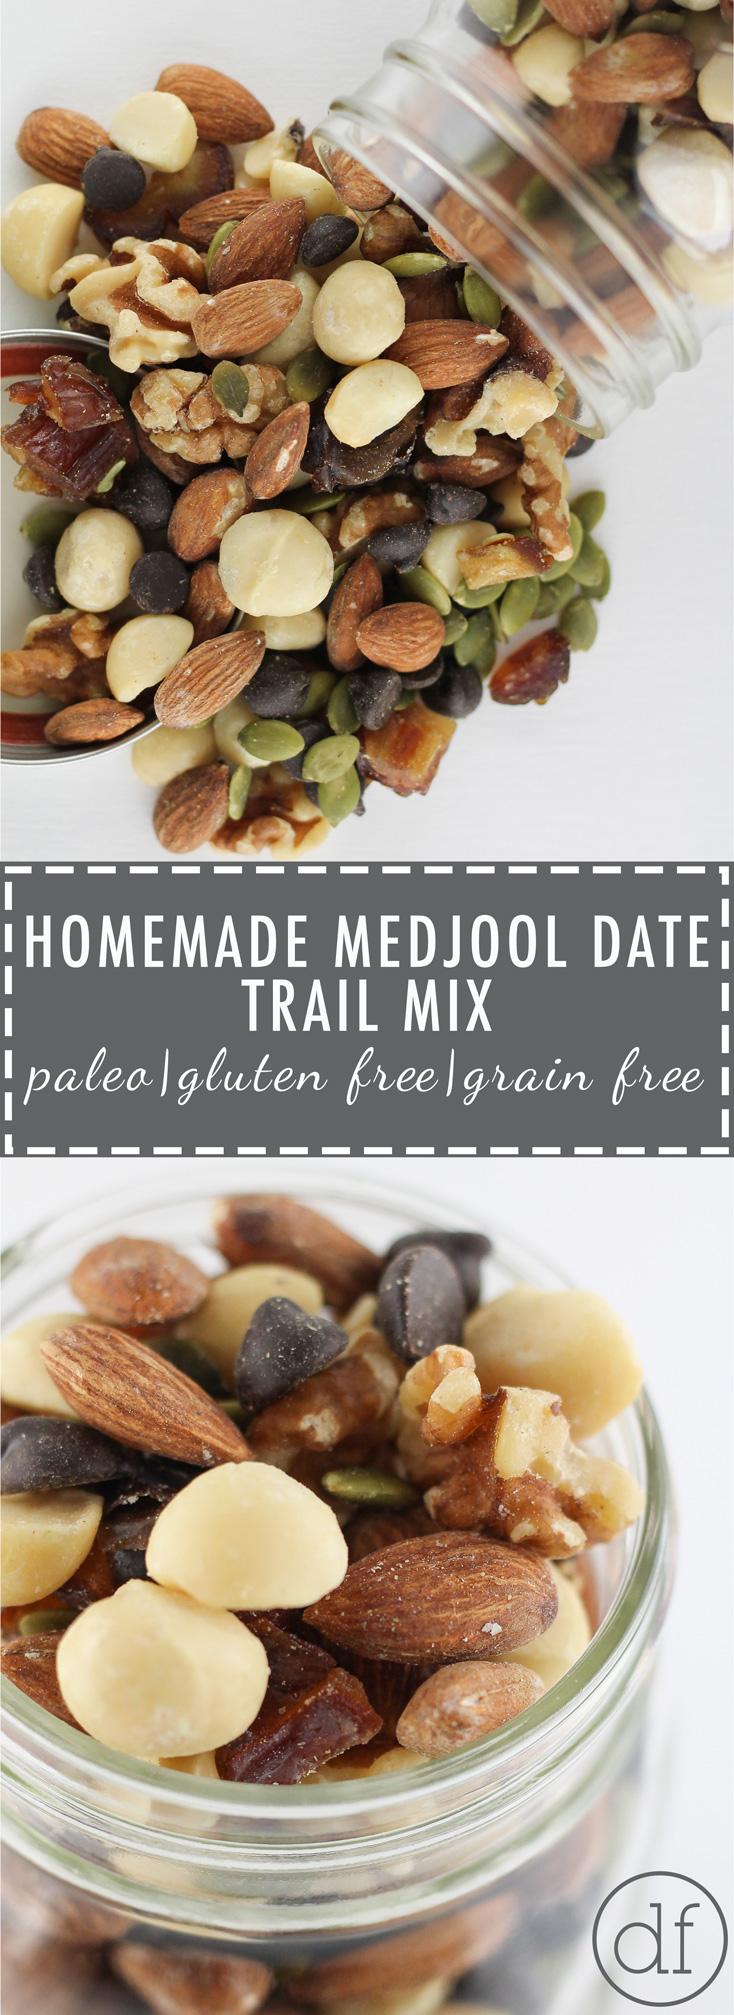 Homemade Trail Mix, Trail Mix, Gluten Free, Grain Free, Dairy Free, Paleo, Paleo Trail Mix, Define Fettle